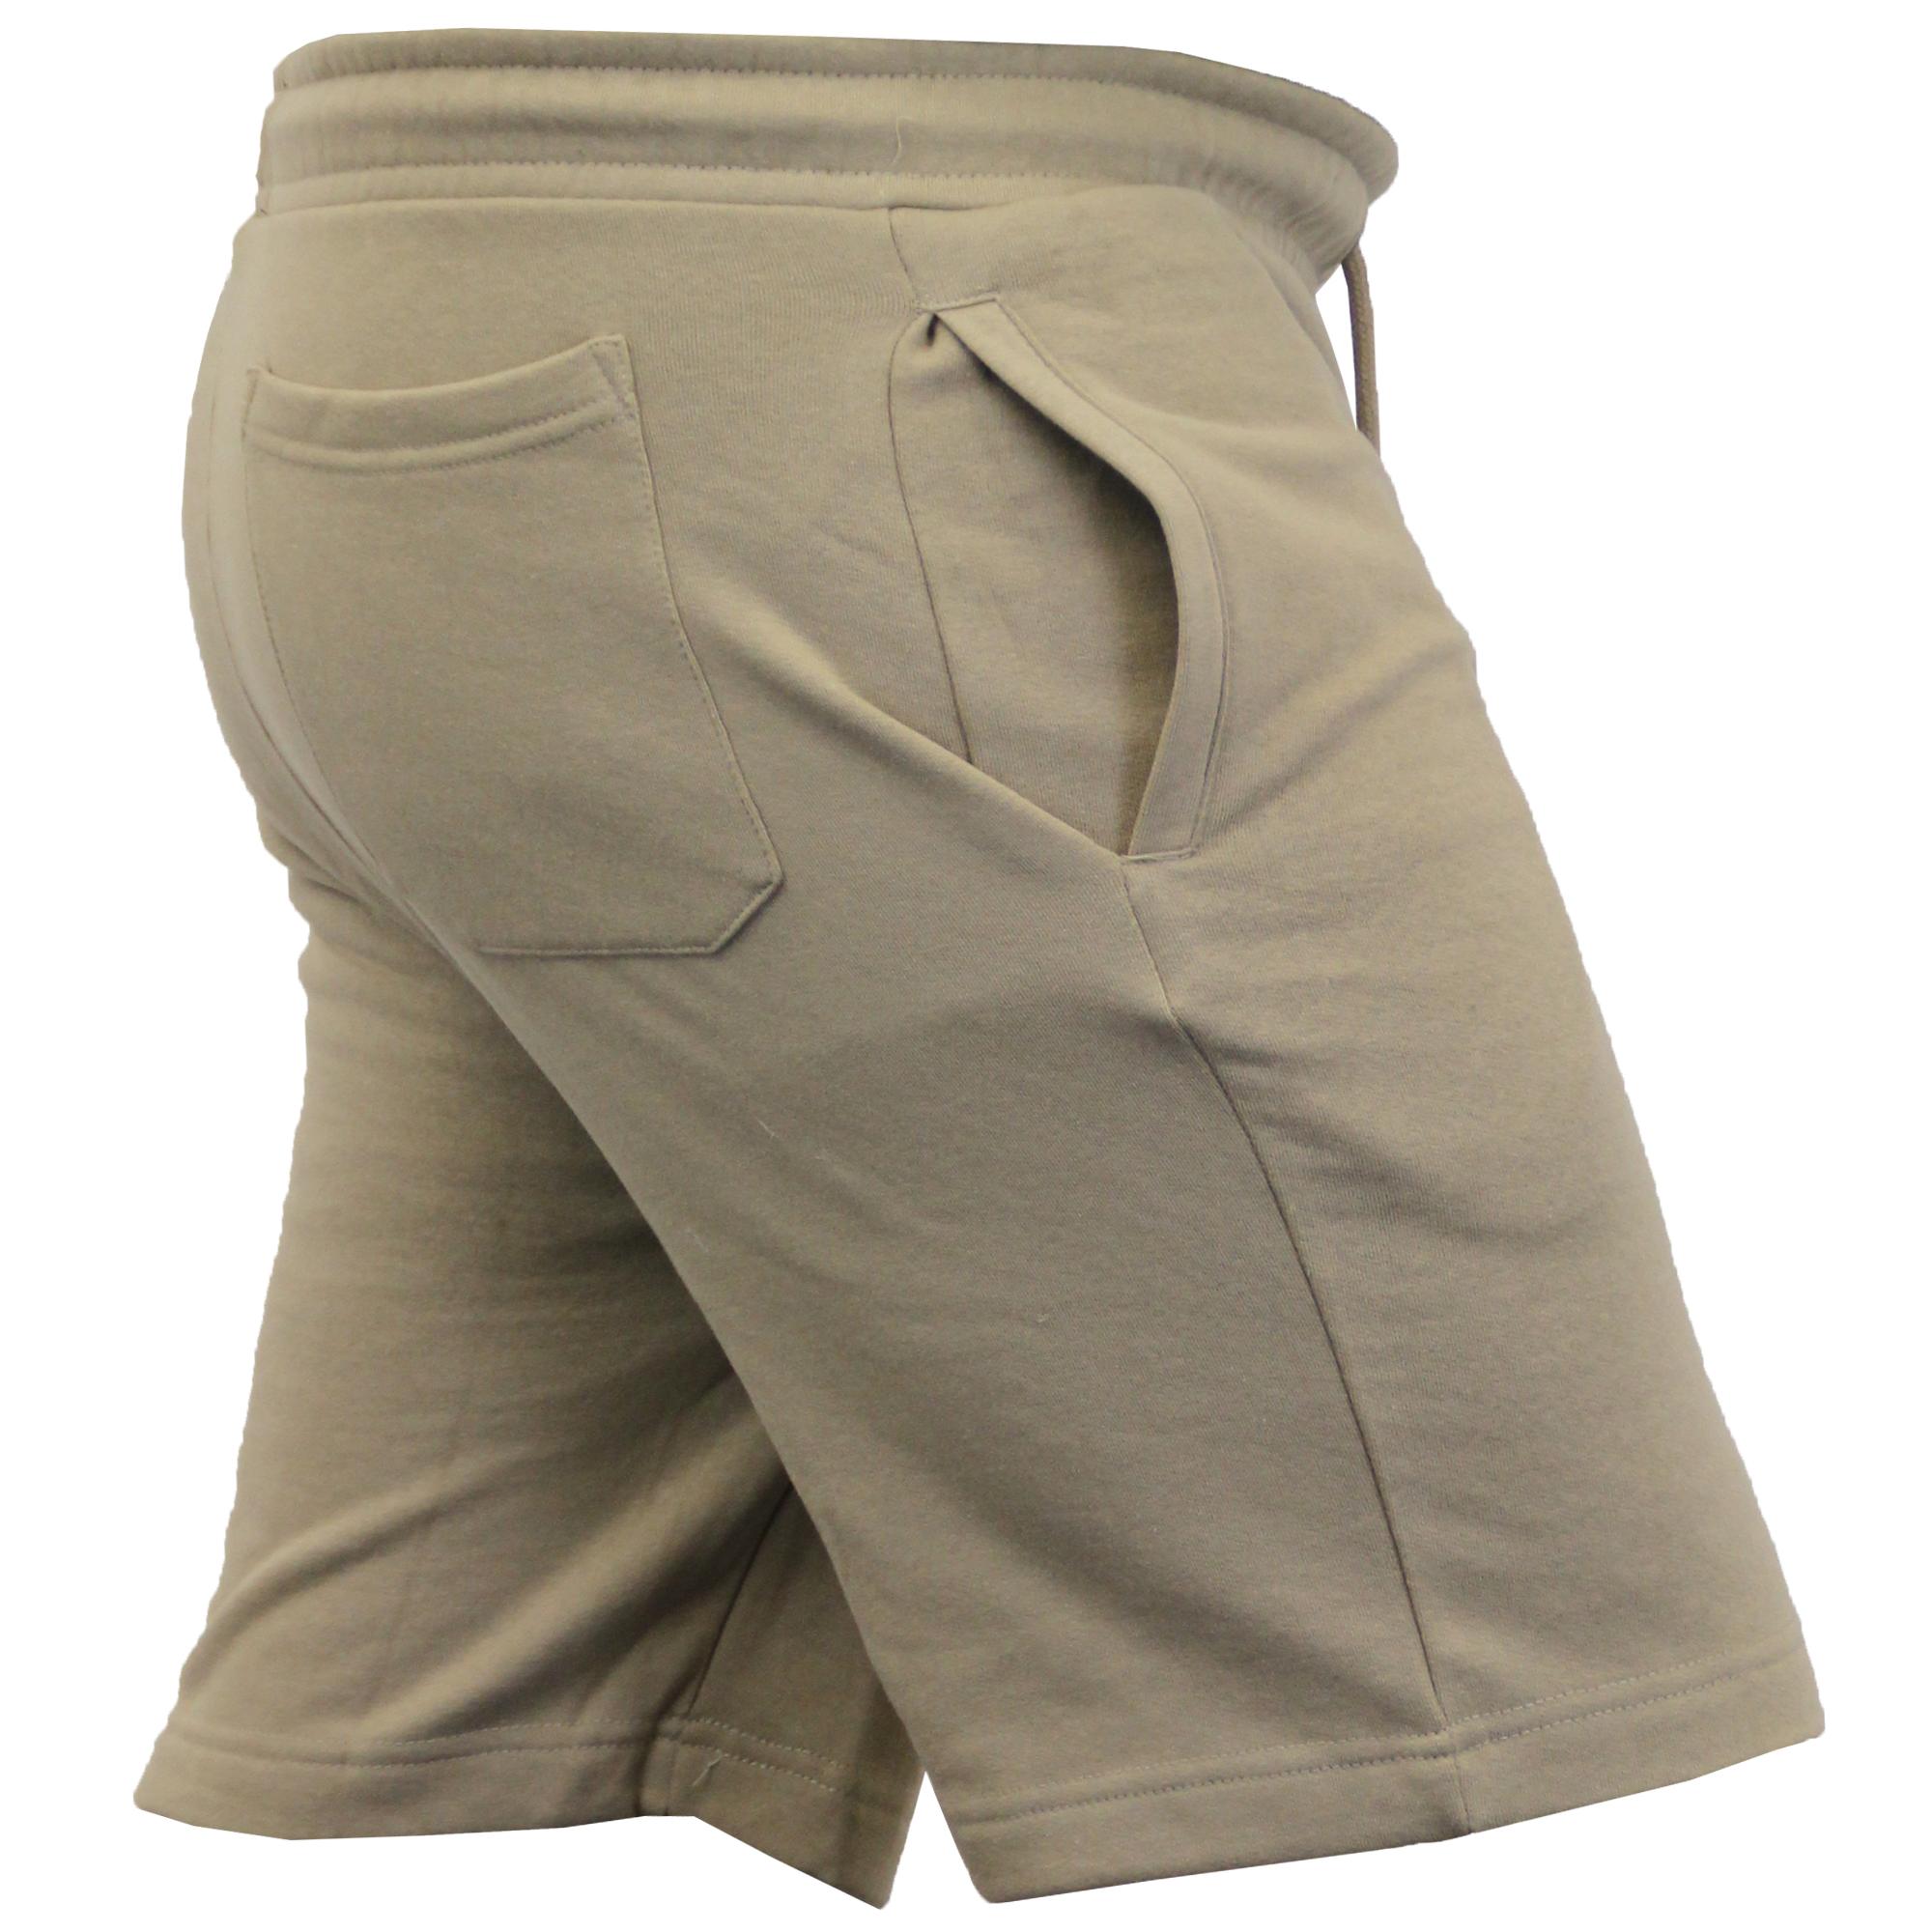 Mens-Jogger-Shorts-Tarley-by-Brave-Soul-Knee-Length-Casual-Fleece-Lined-Summer thumbnail 18